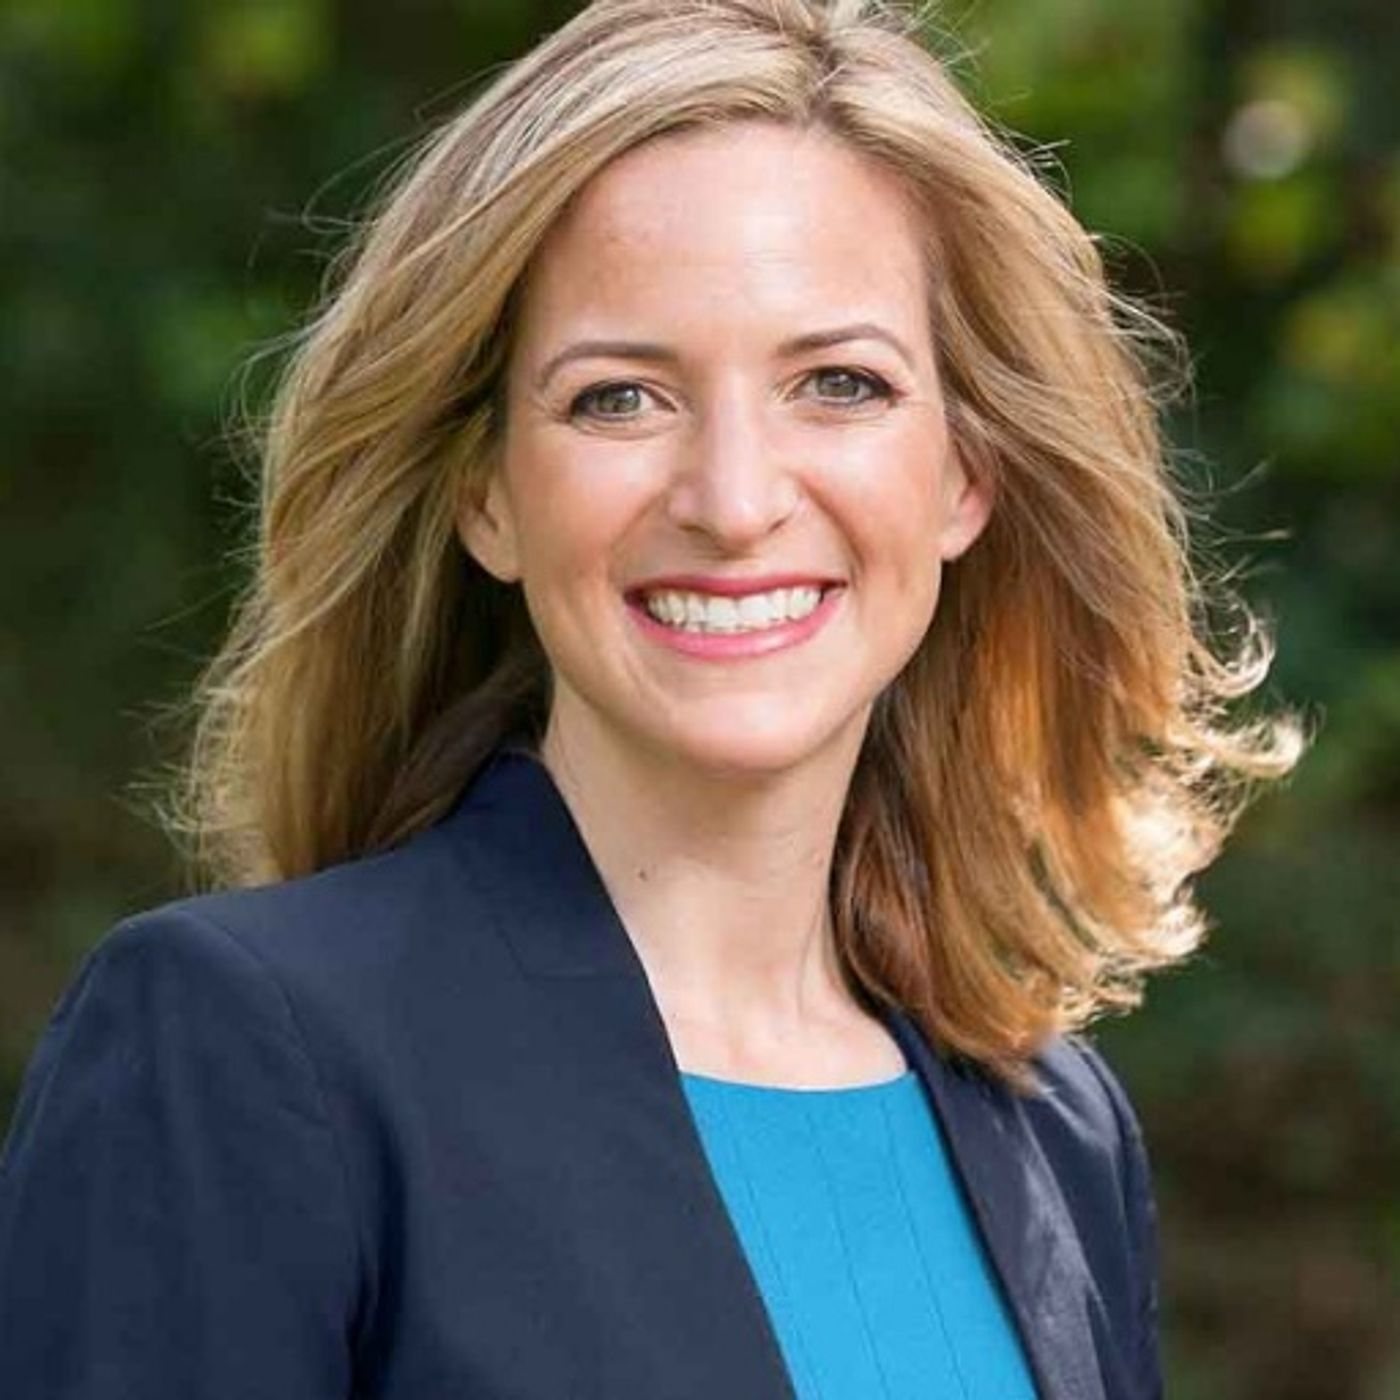 Jocelyn Benson (#VoteHerIn, Episode 72)